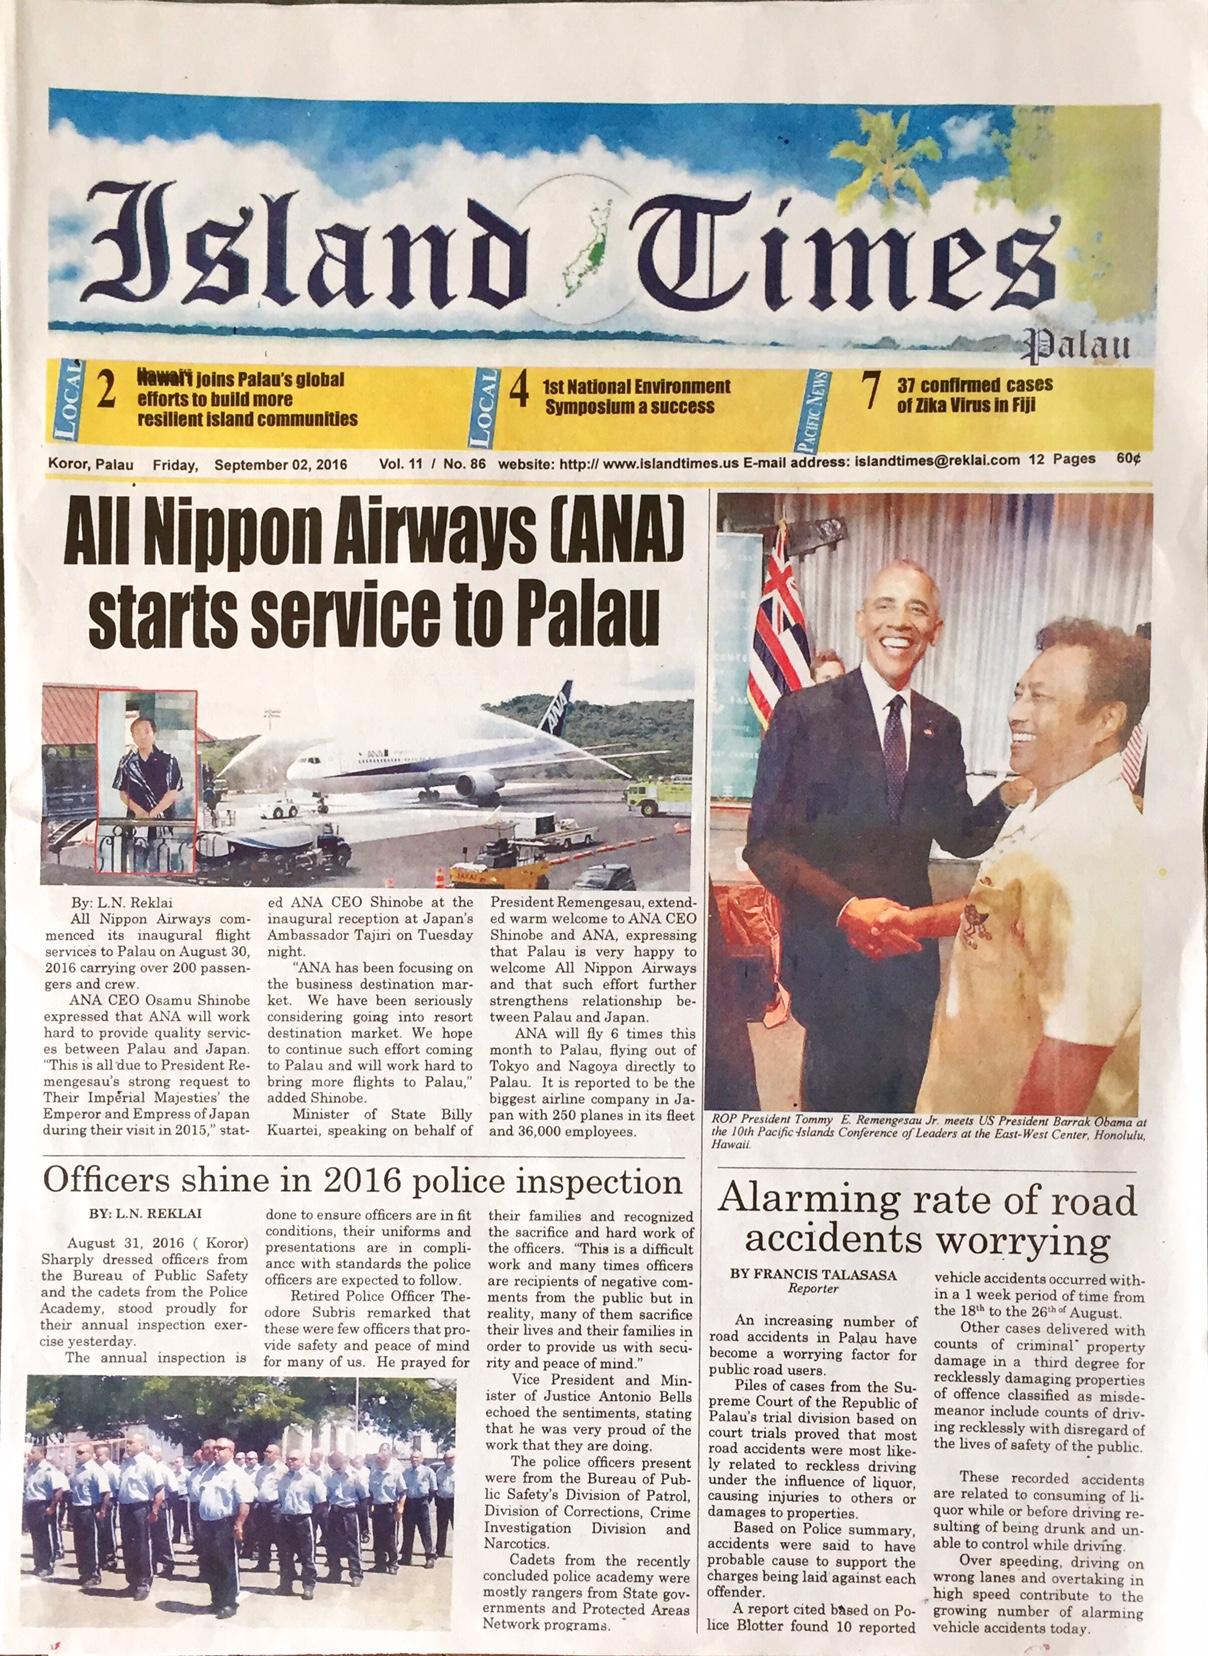 Island Times 9月2日発行